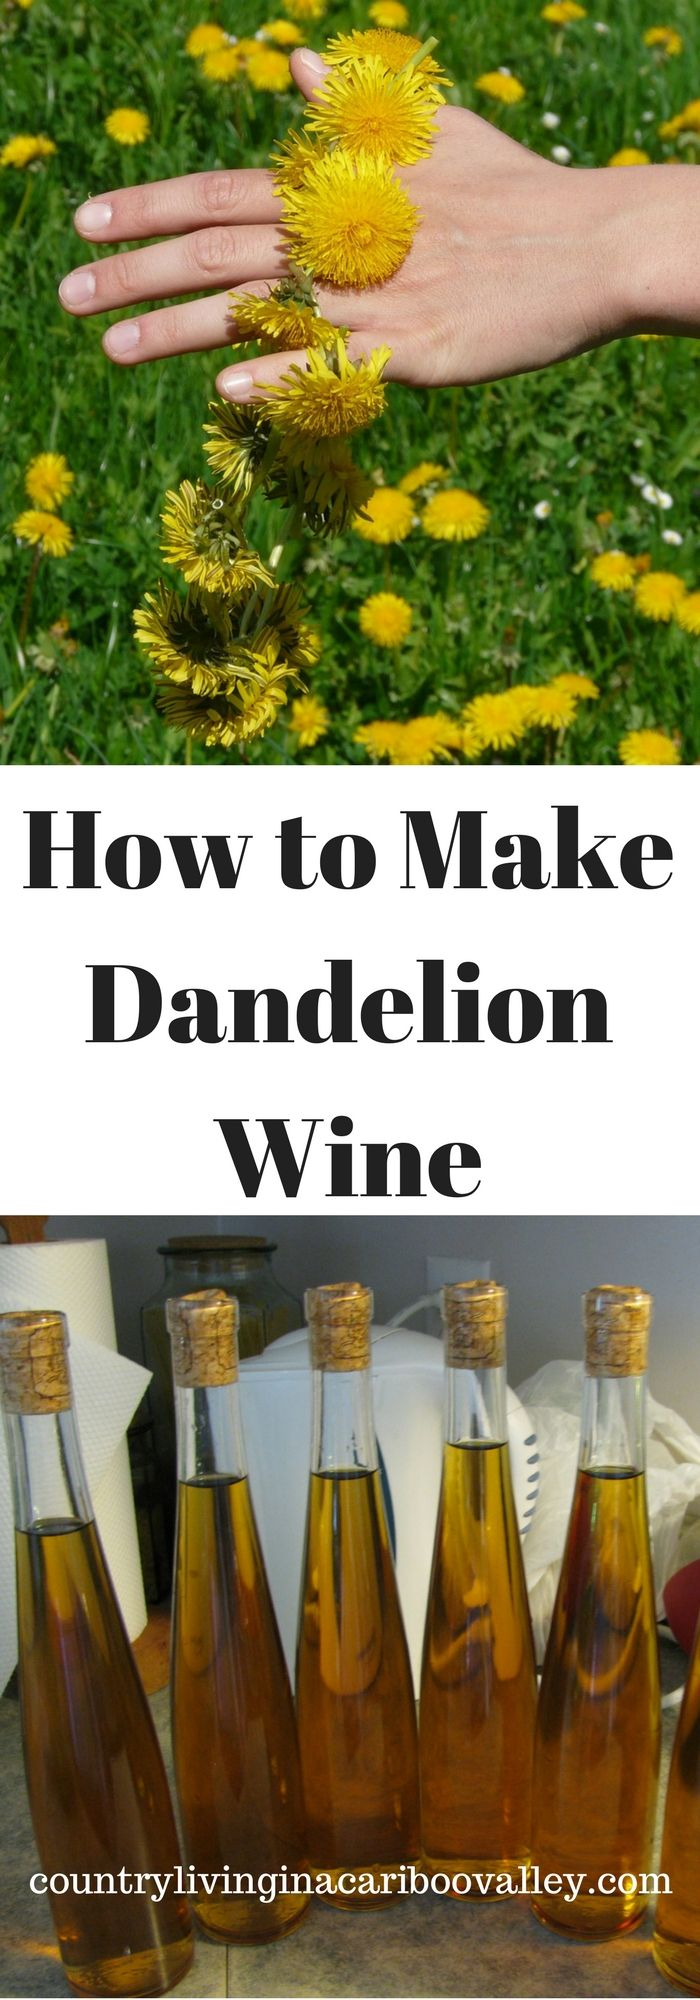 A wonderfully light homemade wine - Dandelion Wine! How to Make it...